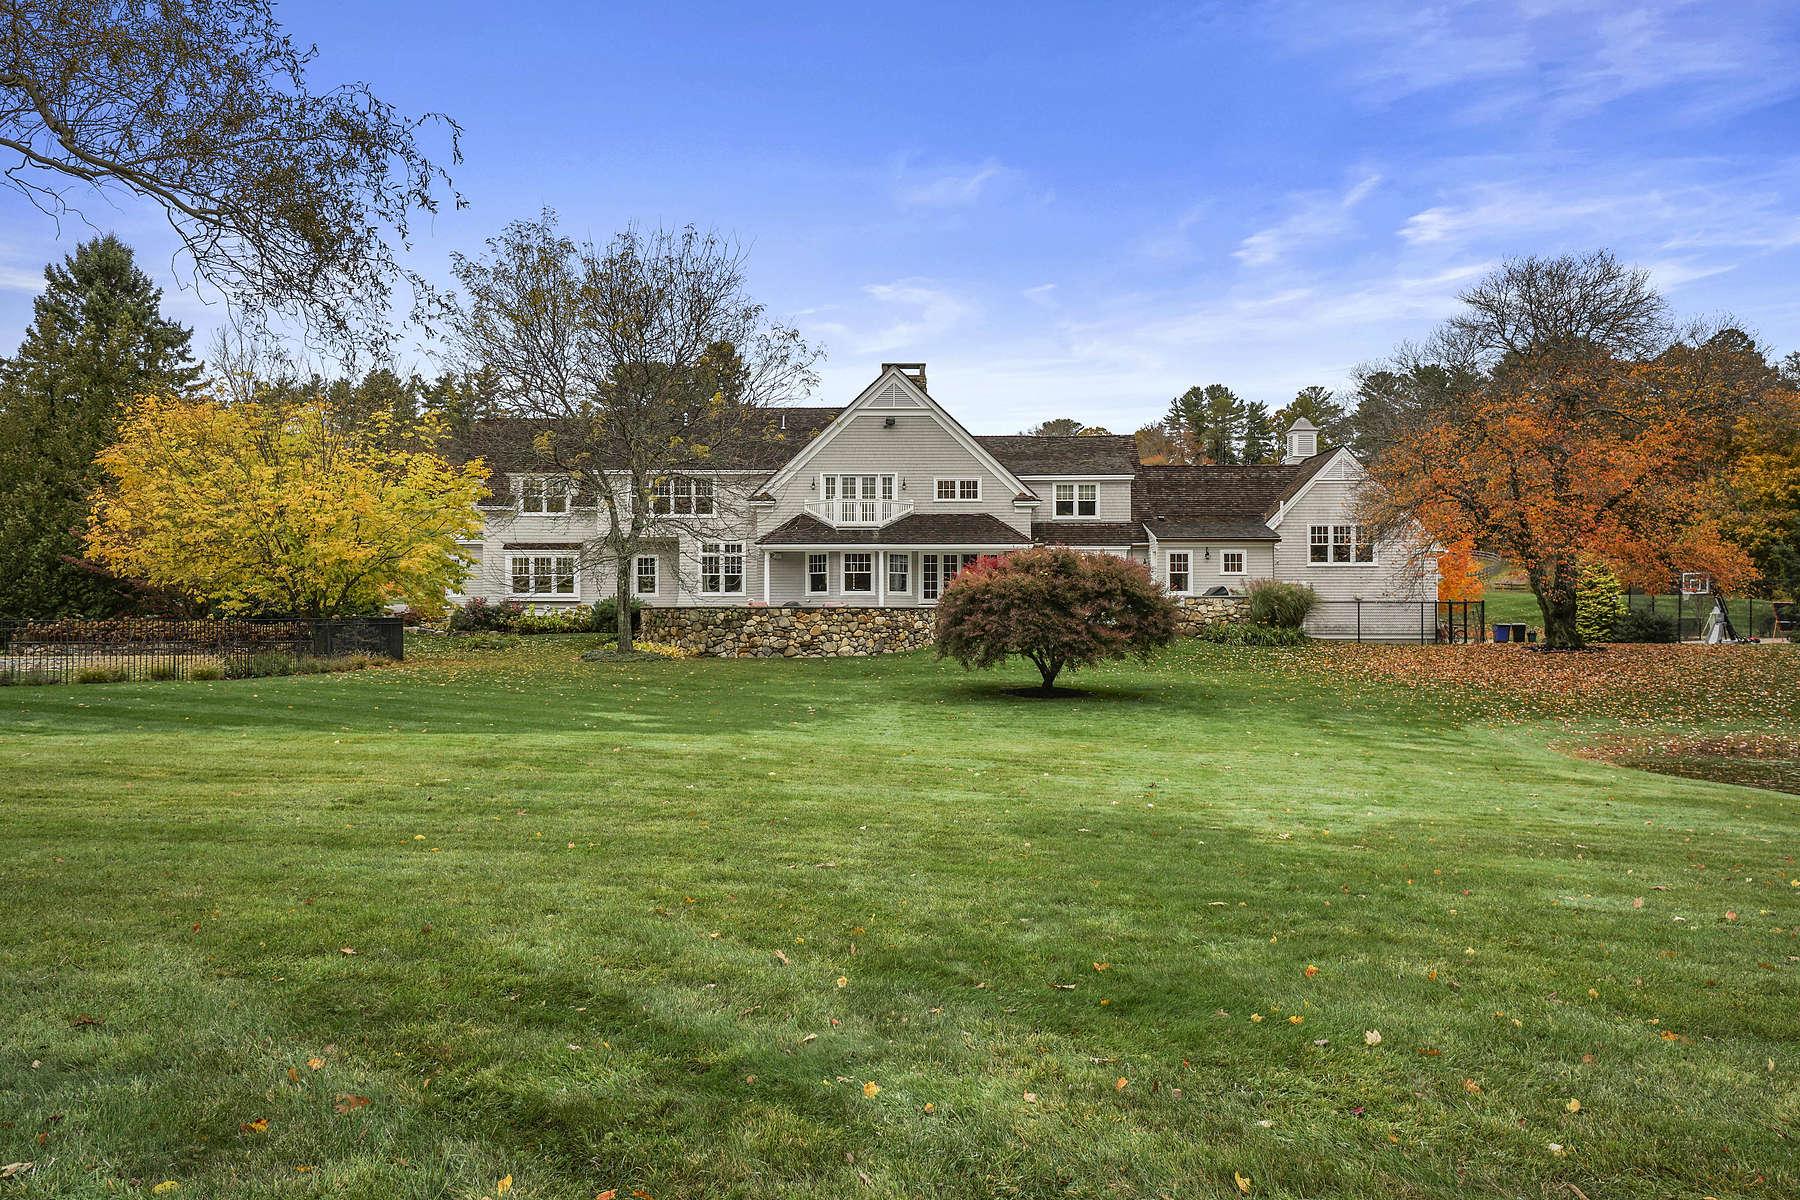 Single Family Homes for Sale at Outstanding Hamilton Estate 35 miles River Road, Hamilton, Massachusetts 01982 United States